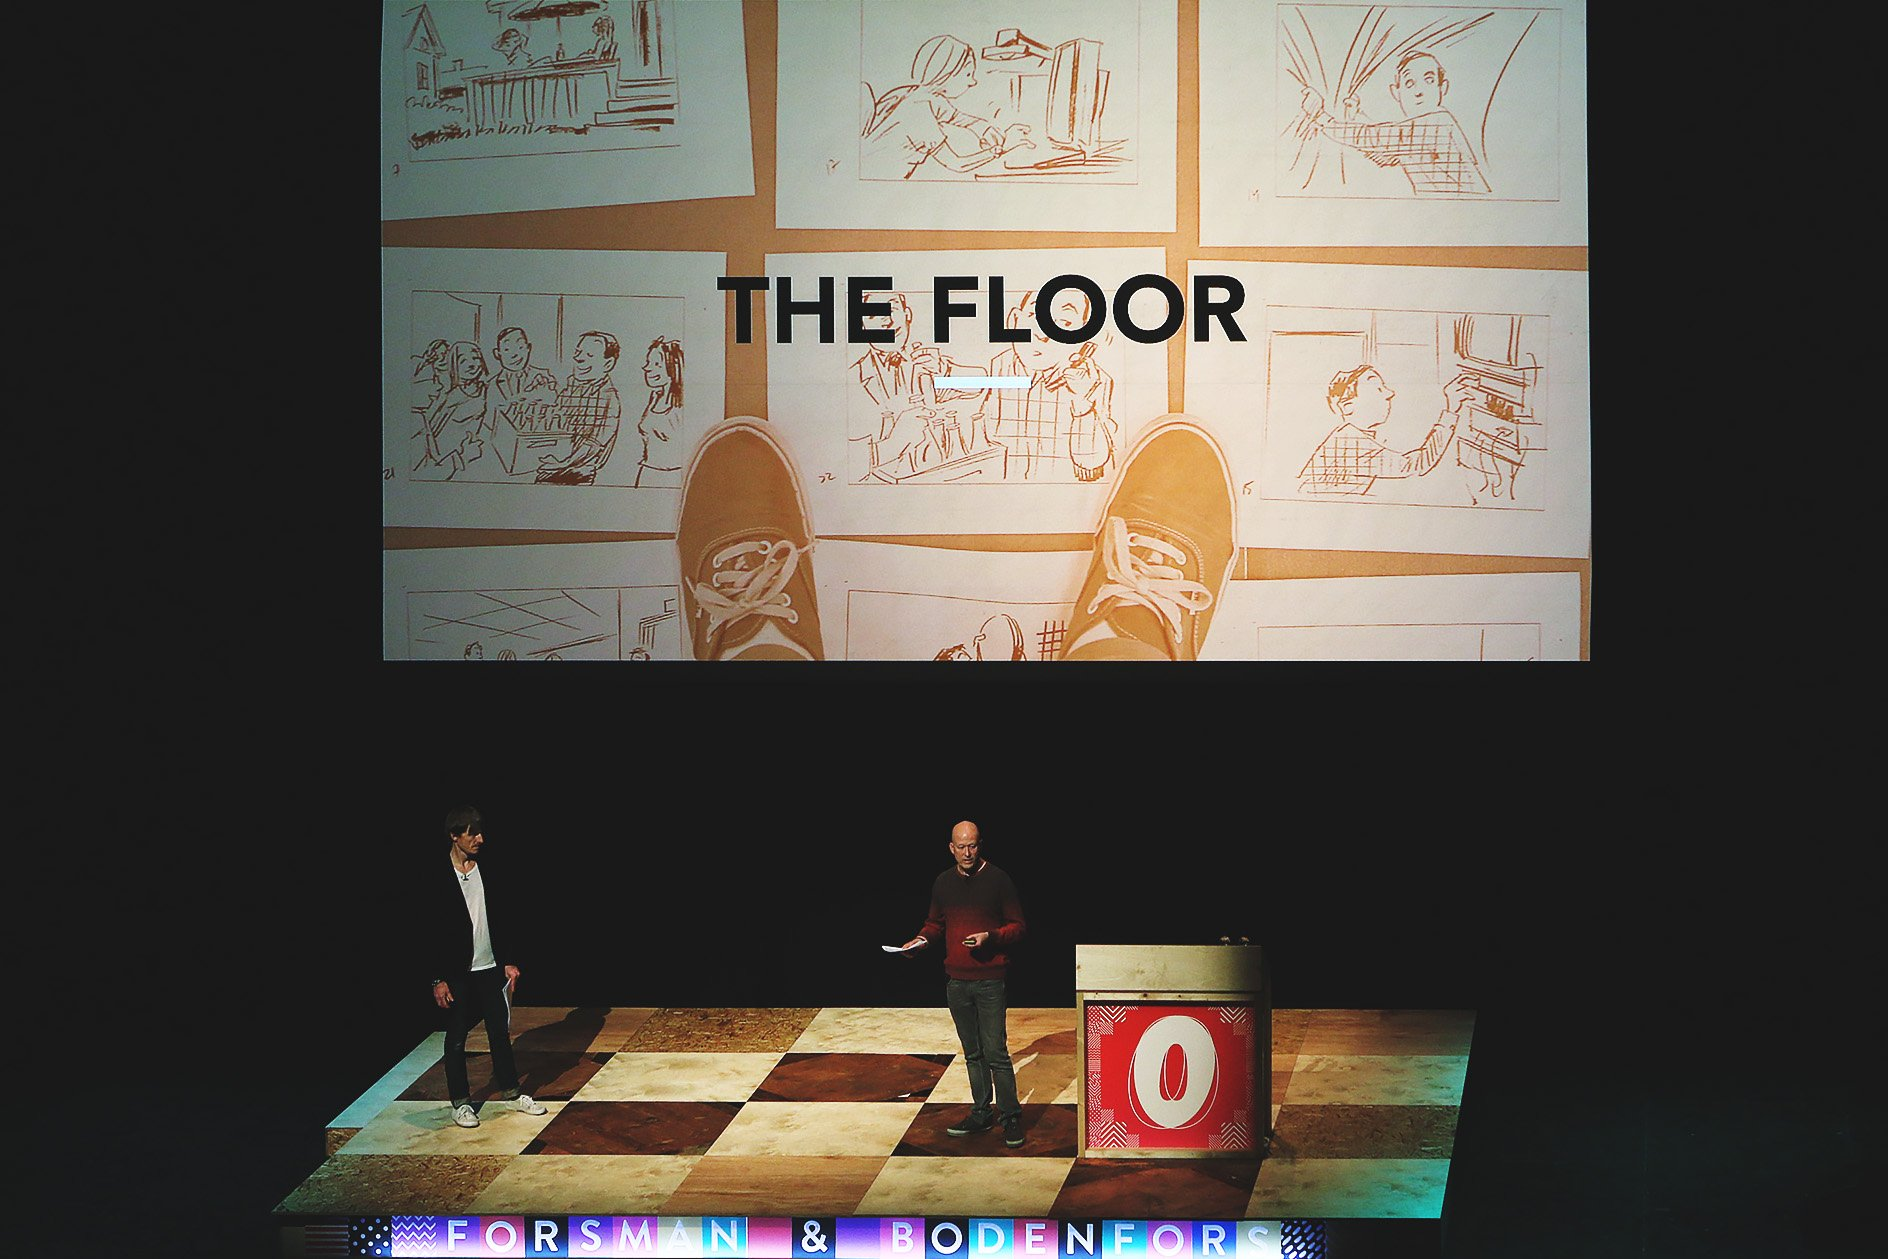 Forsman & Bodenfors at OFFSET 2015 - The Floor